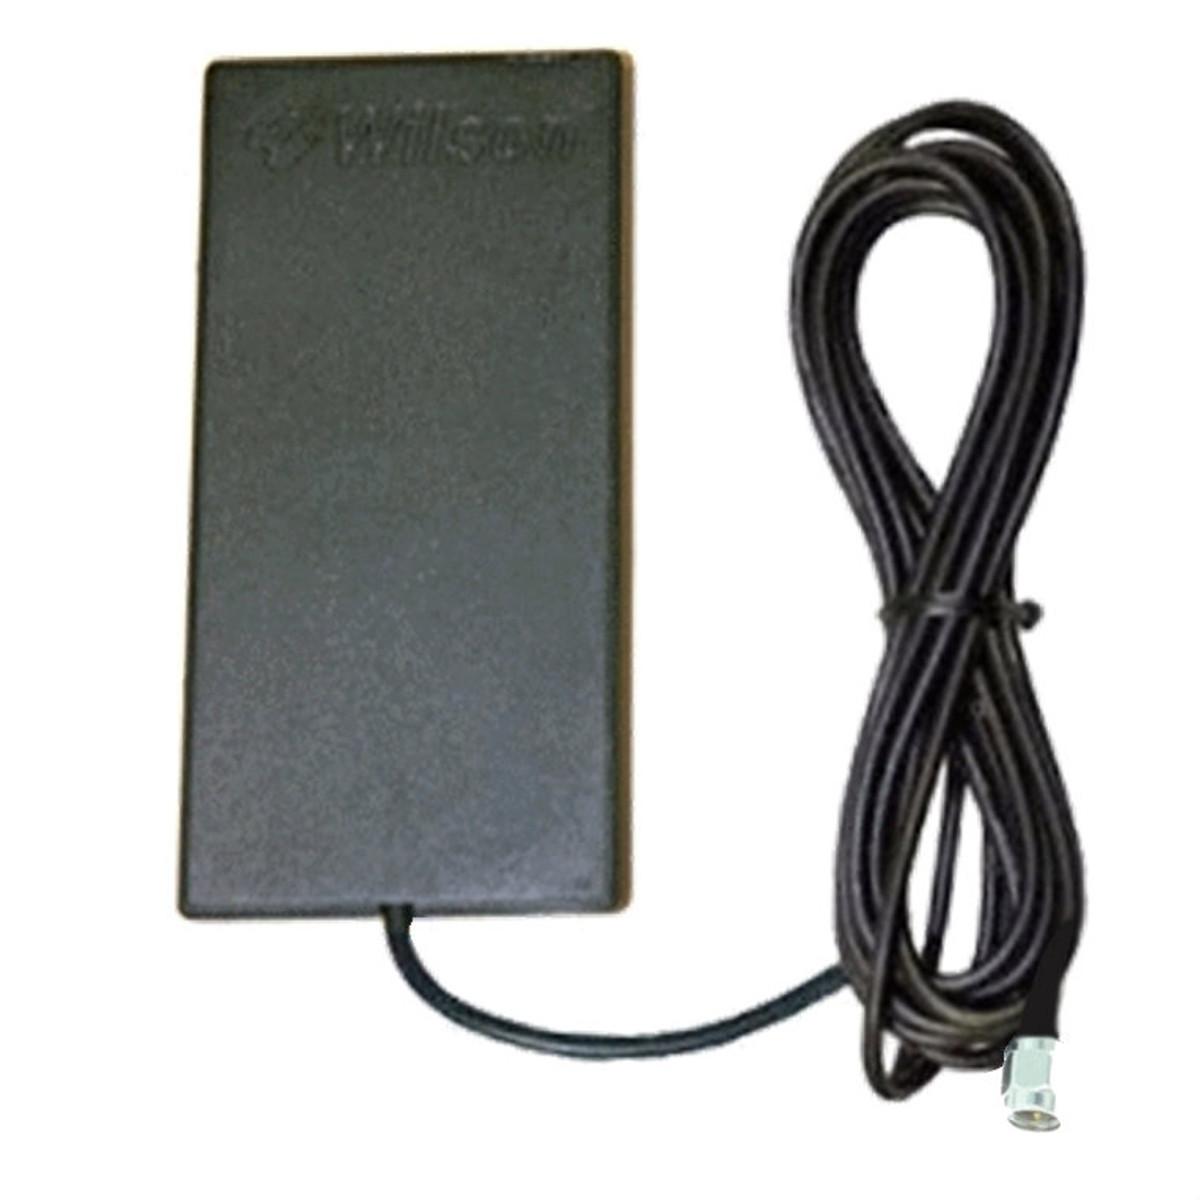 Wilson 301149-B Ultra Slim Antenna w/ SMA-FME Connector